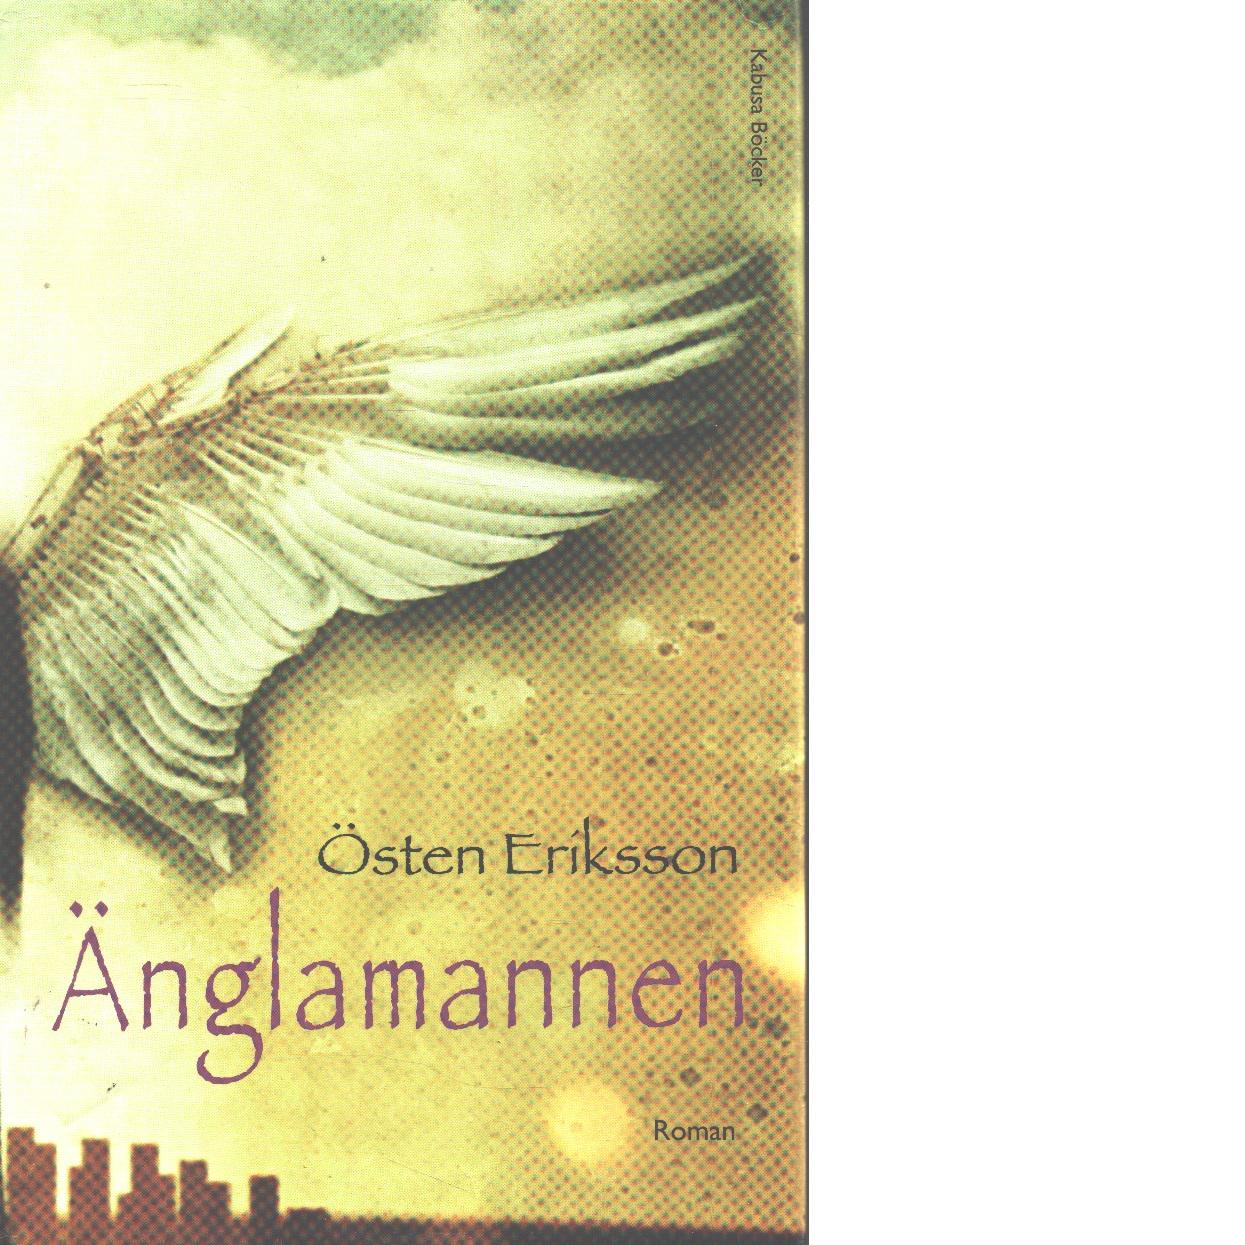 Änglamannen - Eriksson, Östen